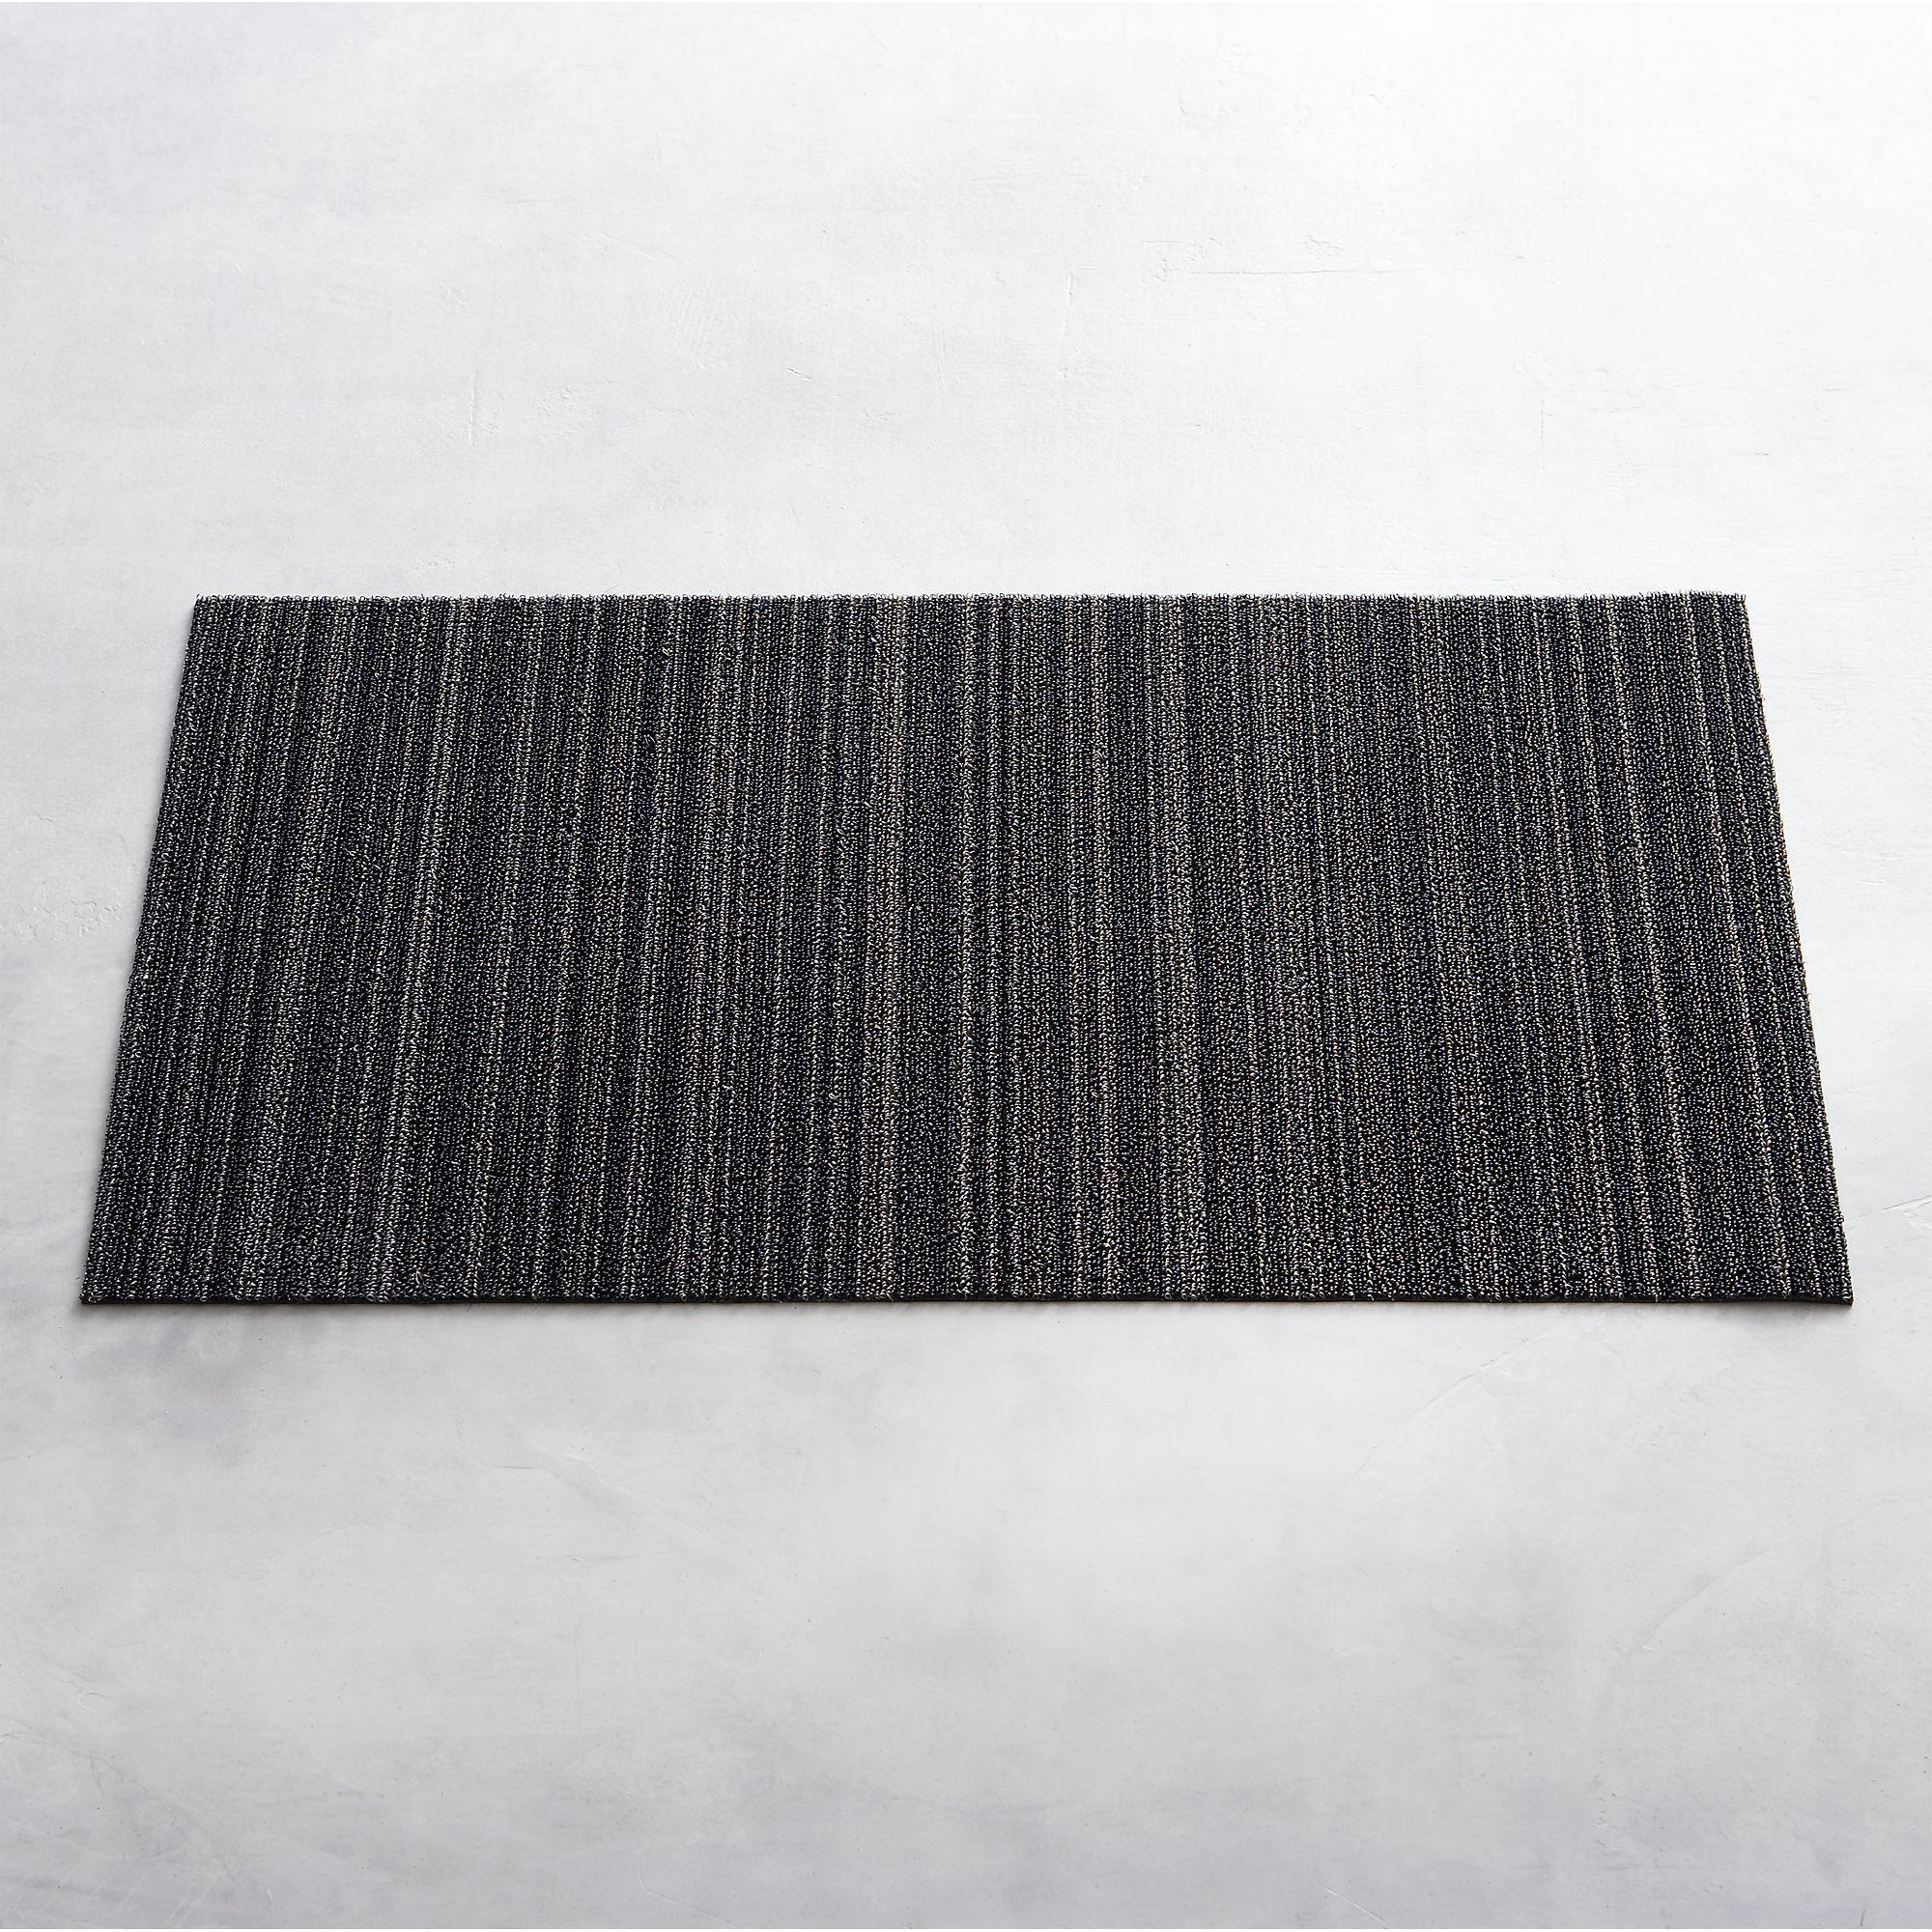 Chilewich Silver Black Striped 20 X36 Doormat Crate Barrel Crates Entry Rug